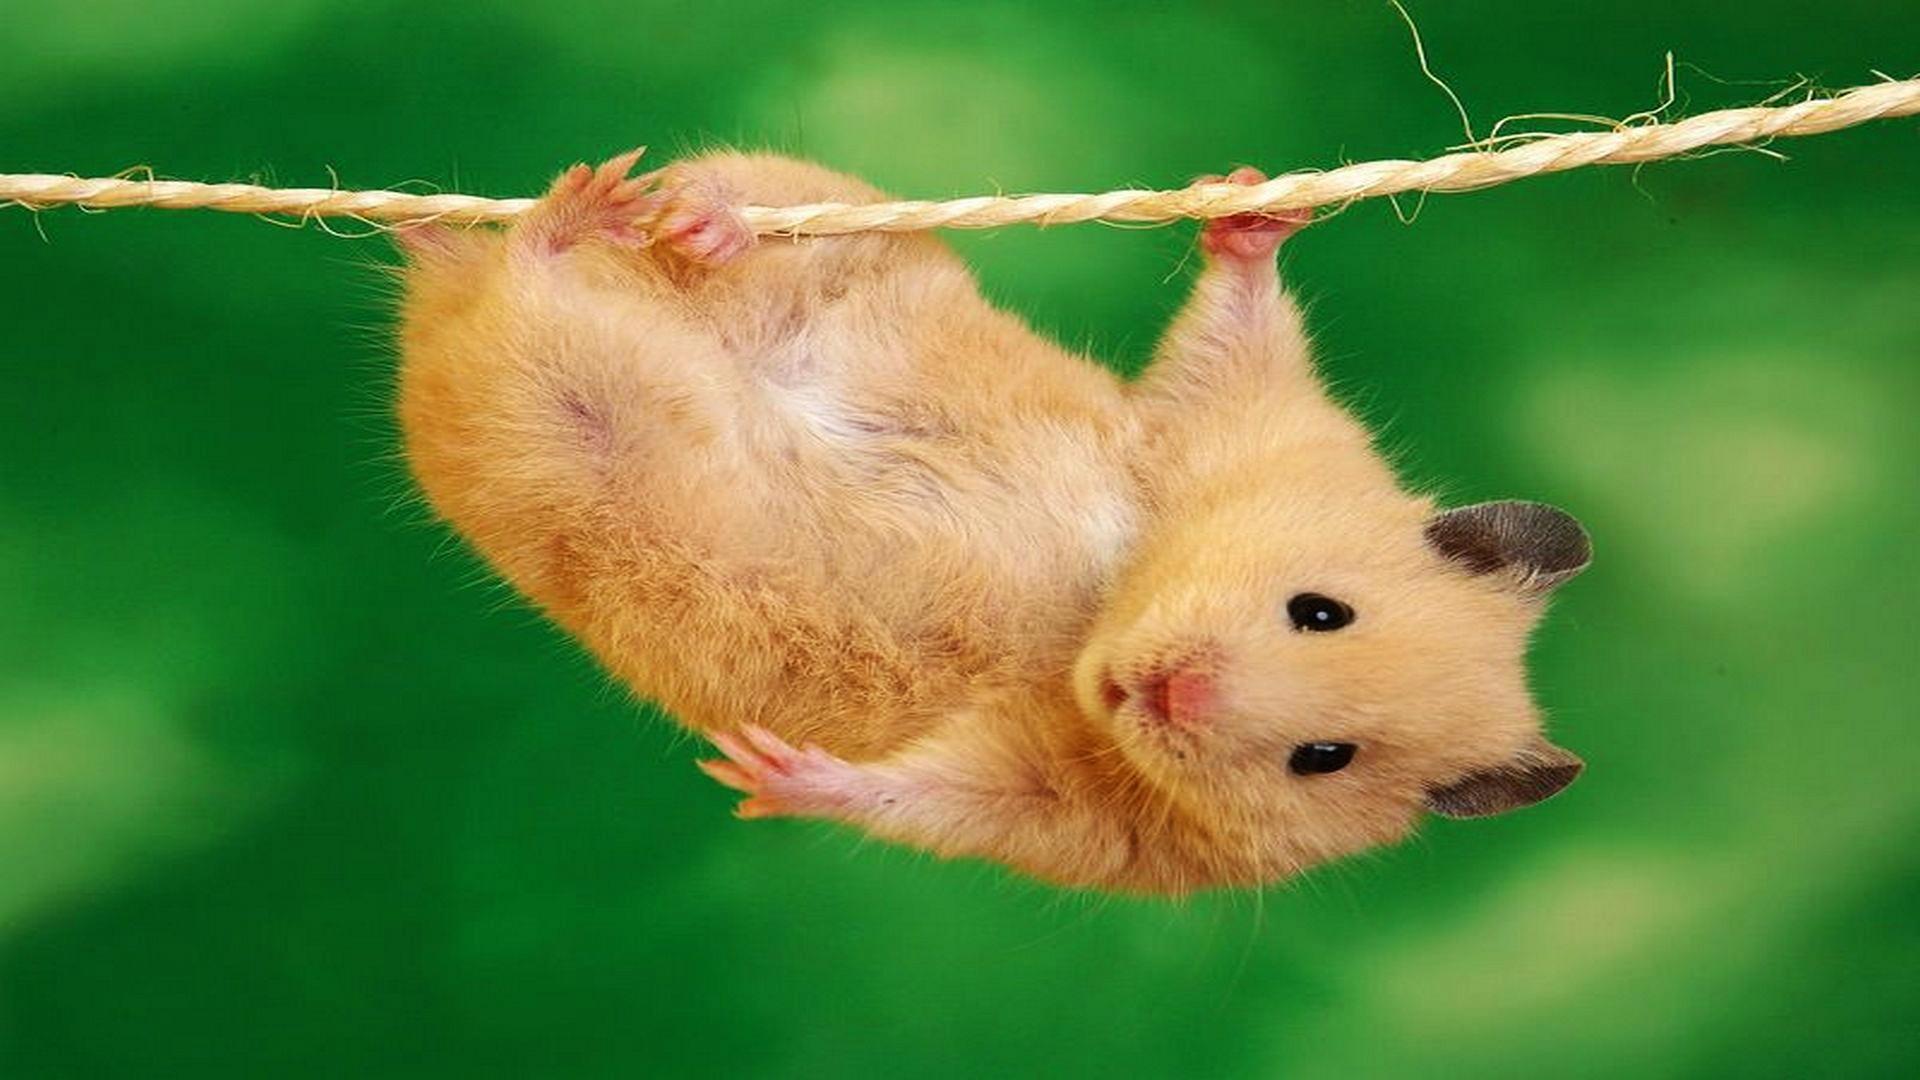 Pics Photos   Wallpapers Desktop Hamster Funny Image 1920x1080